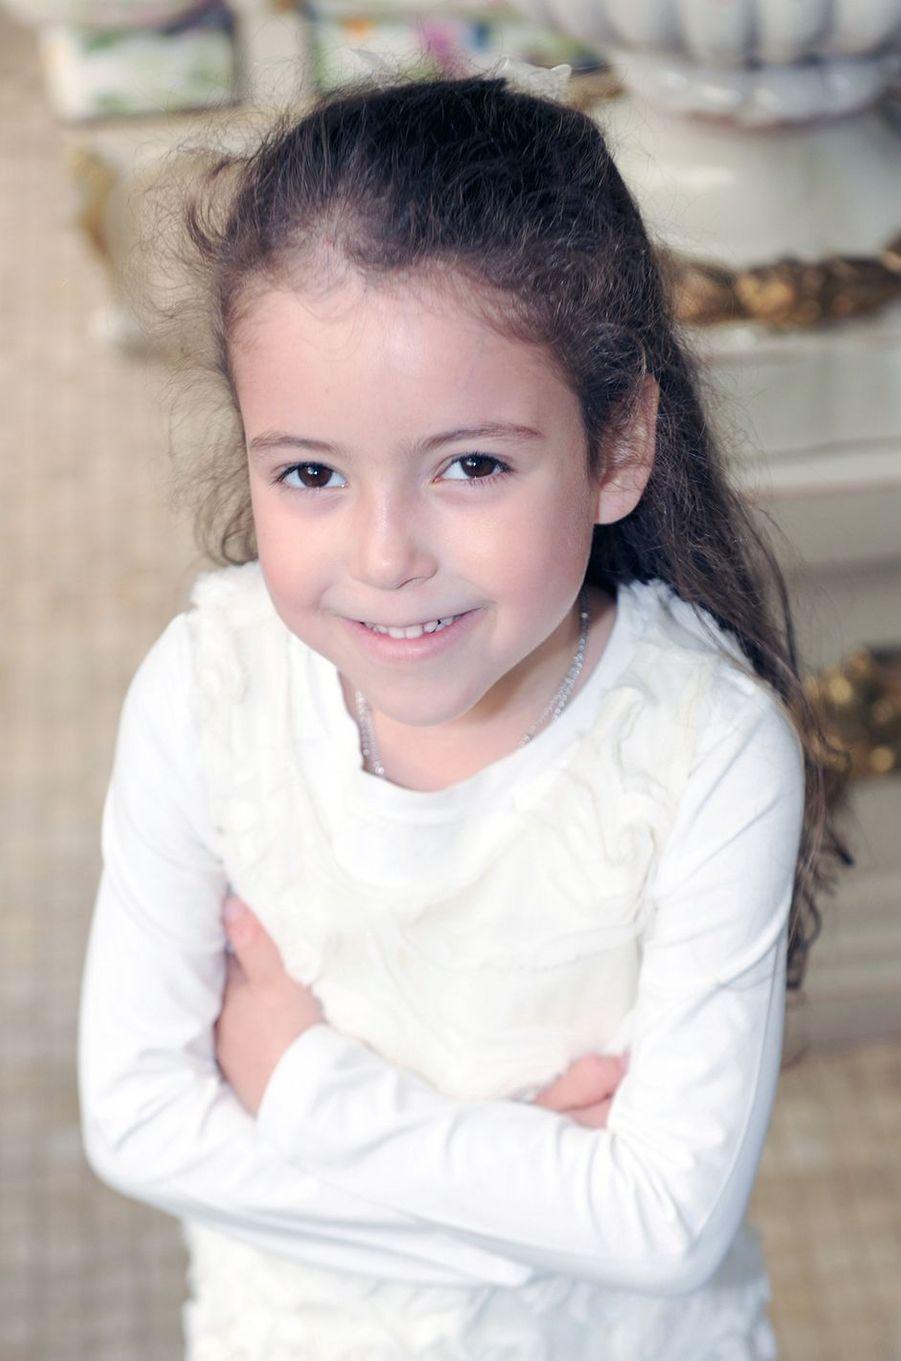 La princesse Lalla Khadija du Maroc, le 28 février 2012